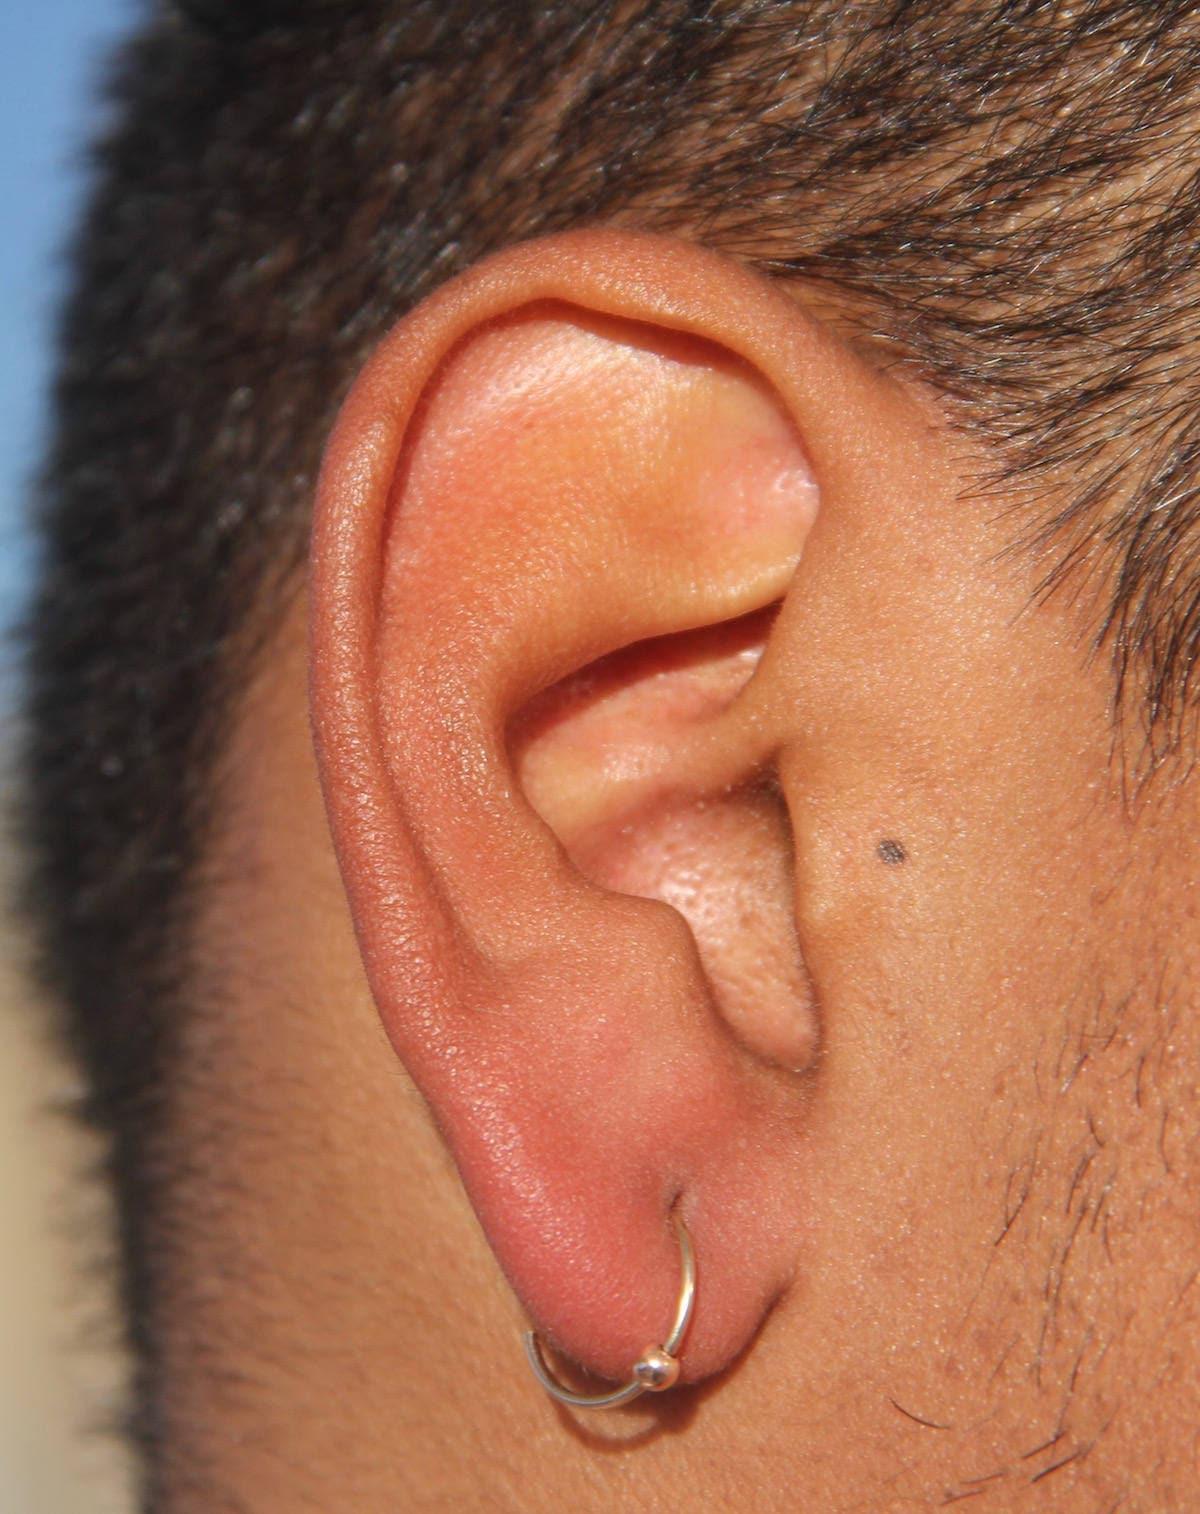 36c0ddf55254a4 Men Earrings-Men Gold Earrings Hoop Earrings-Gold Hoop | Etsy